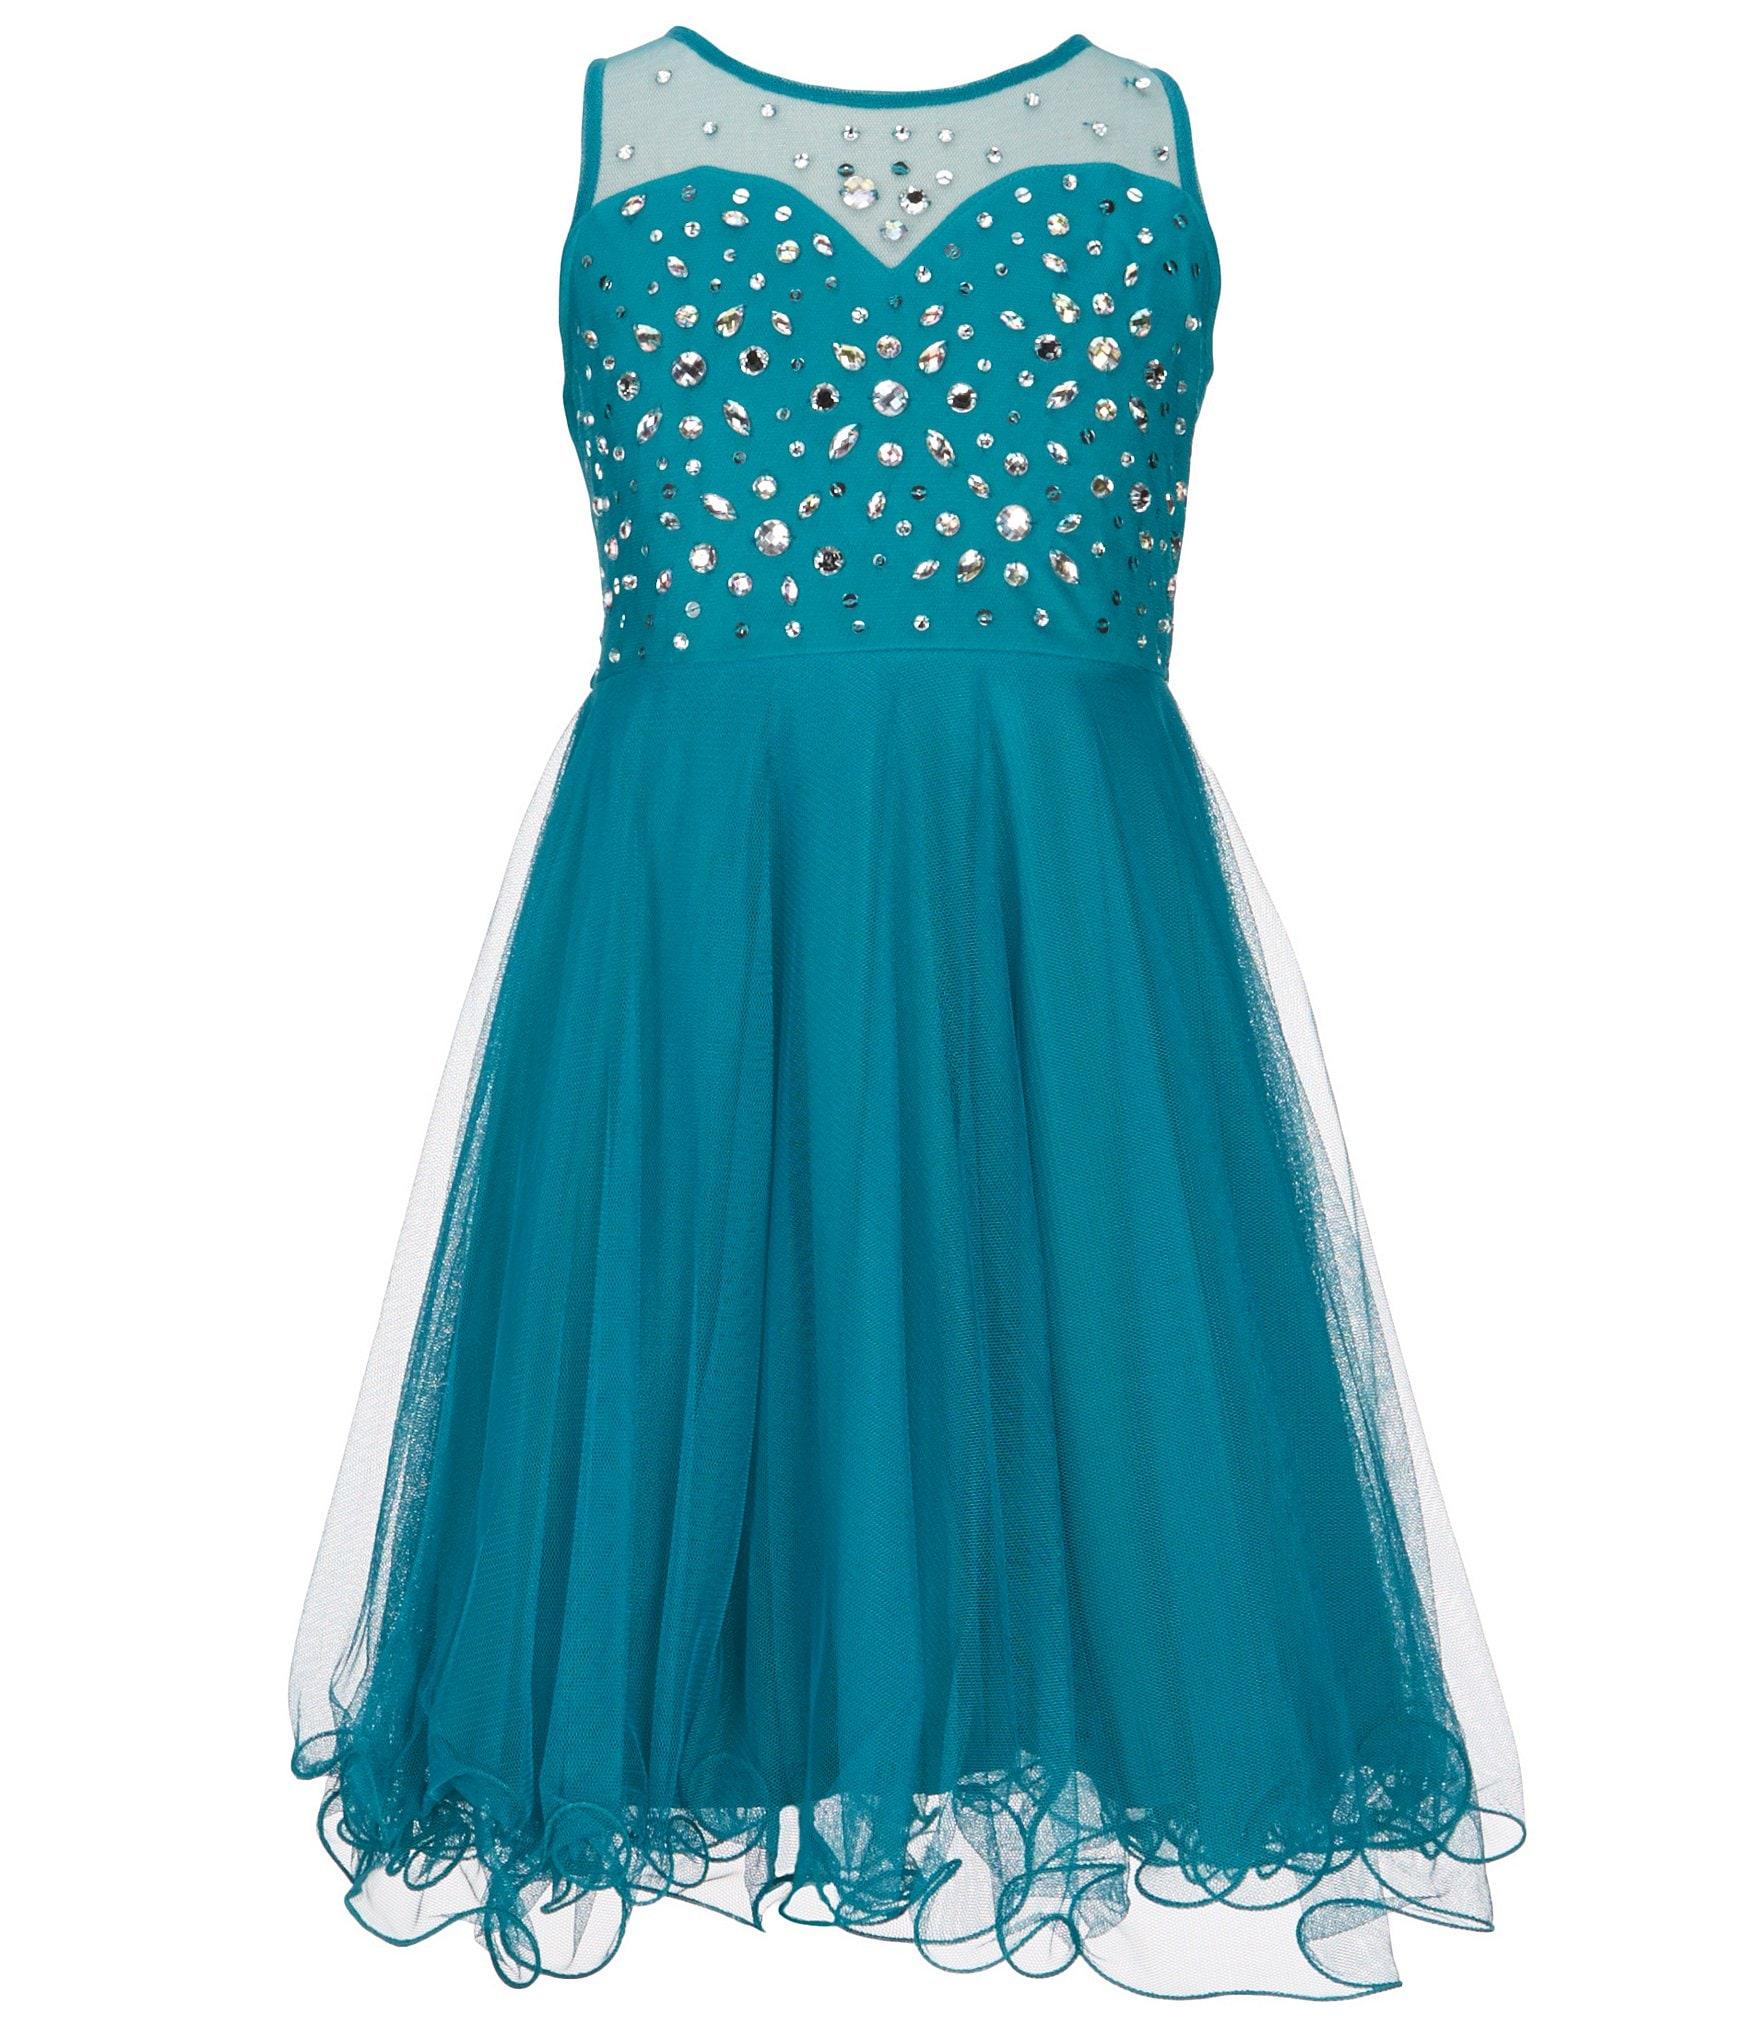 Modern Party Dress For Tweens Mold - All Wedding Dresses ...